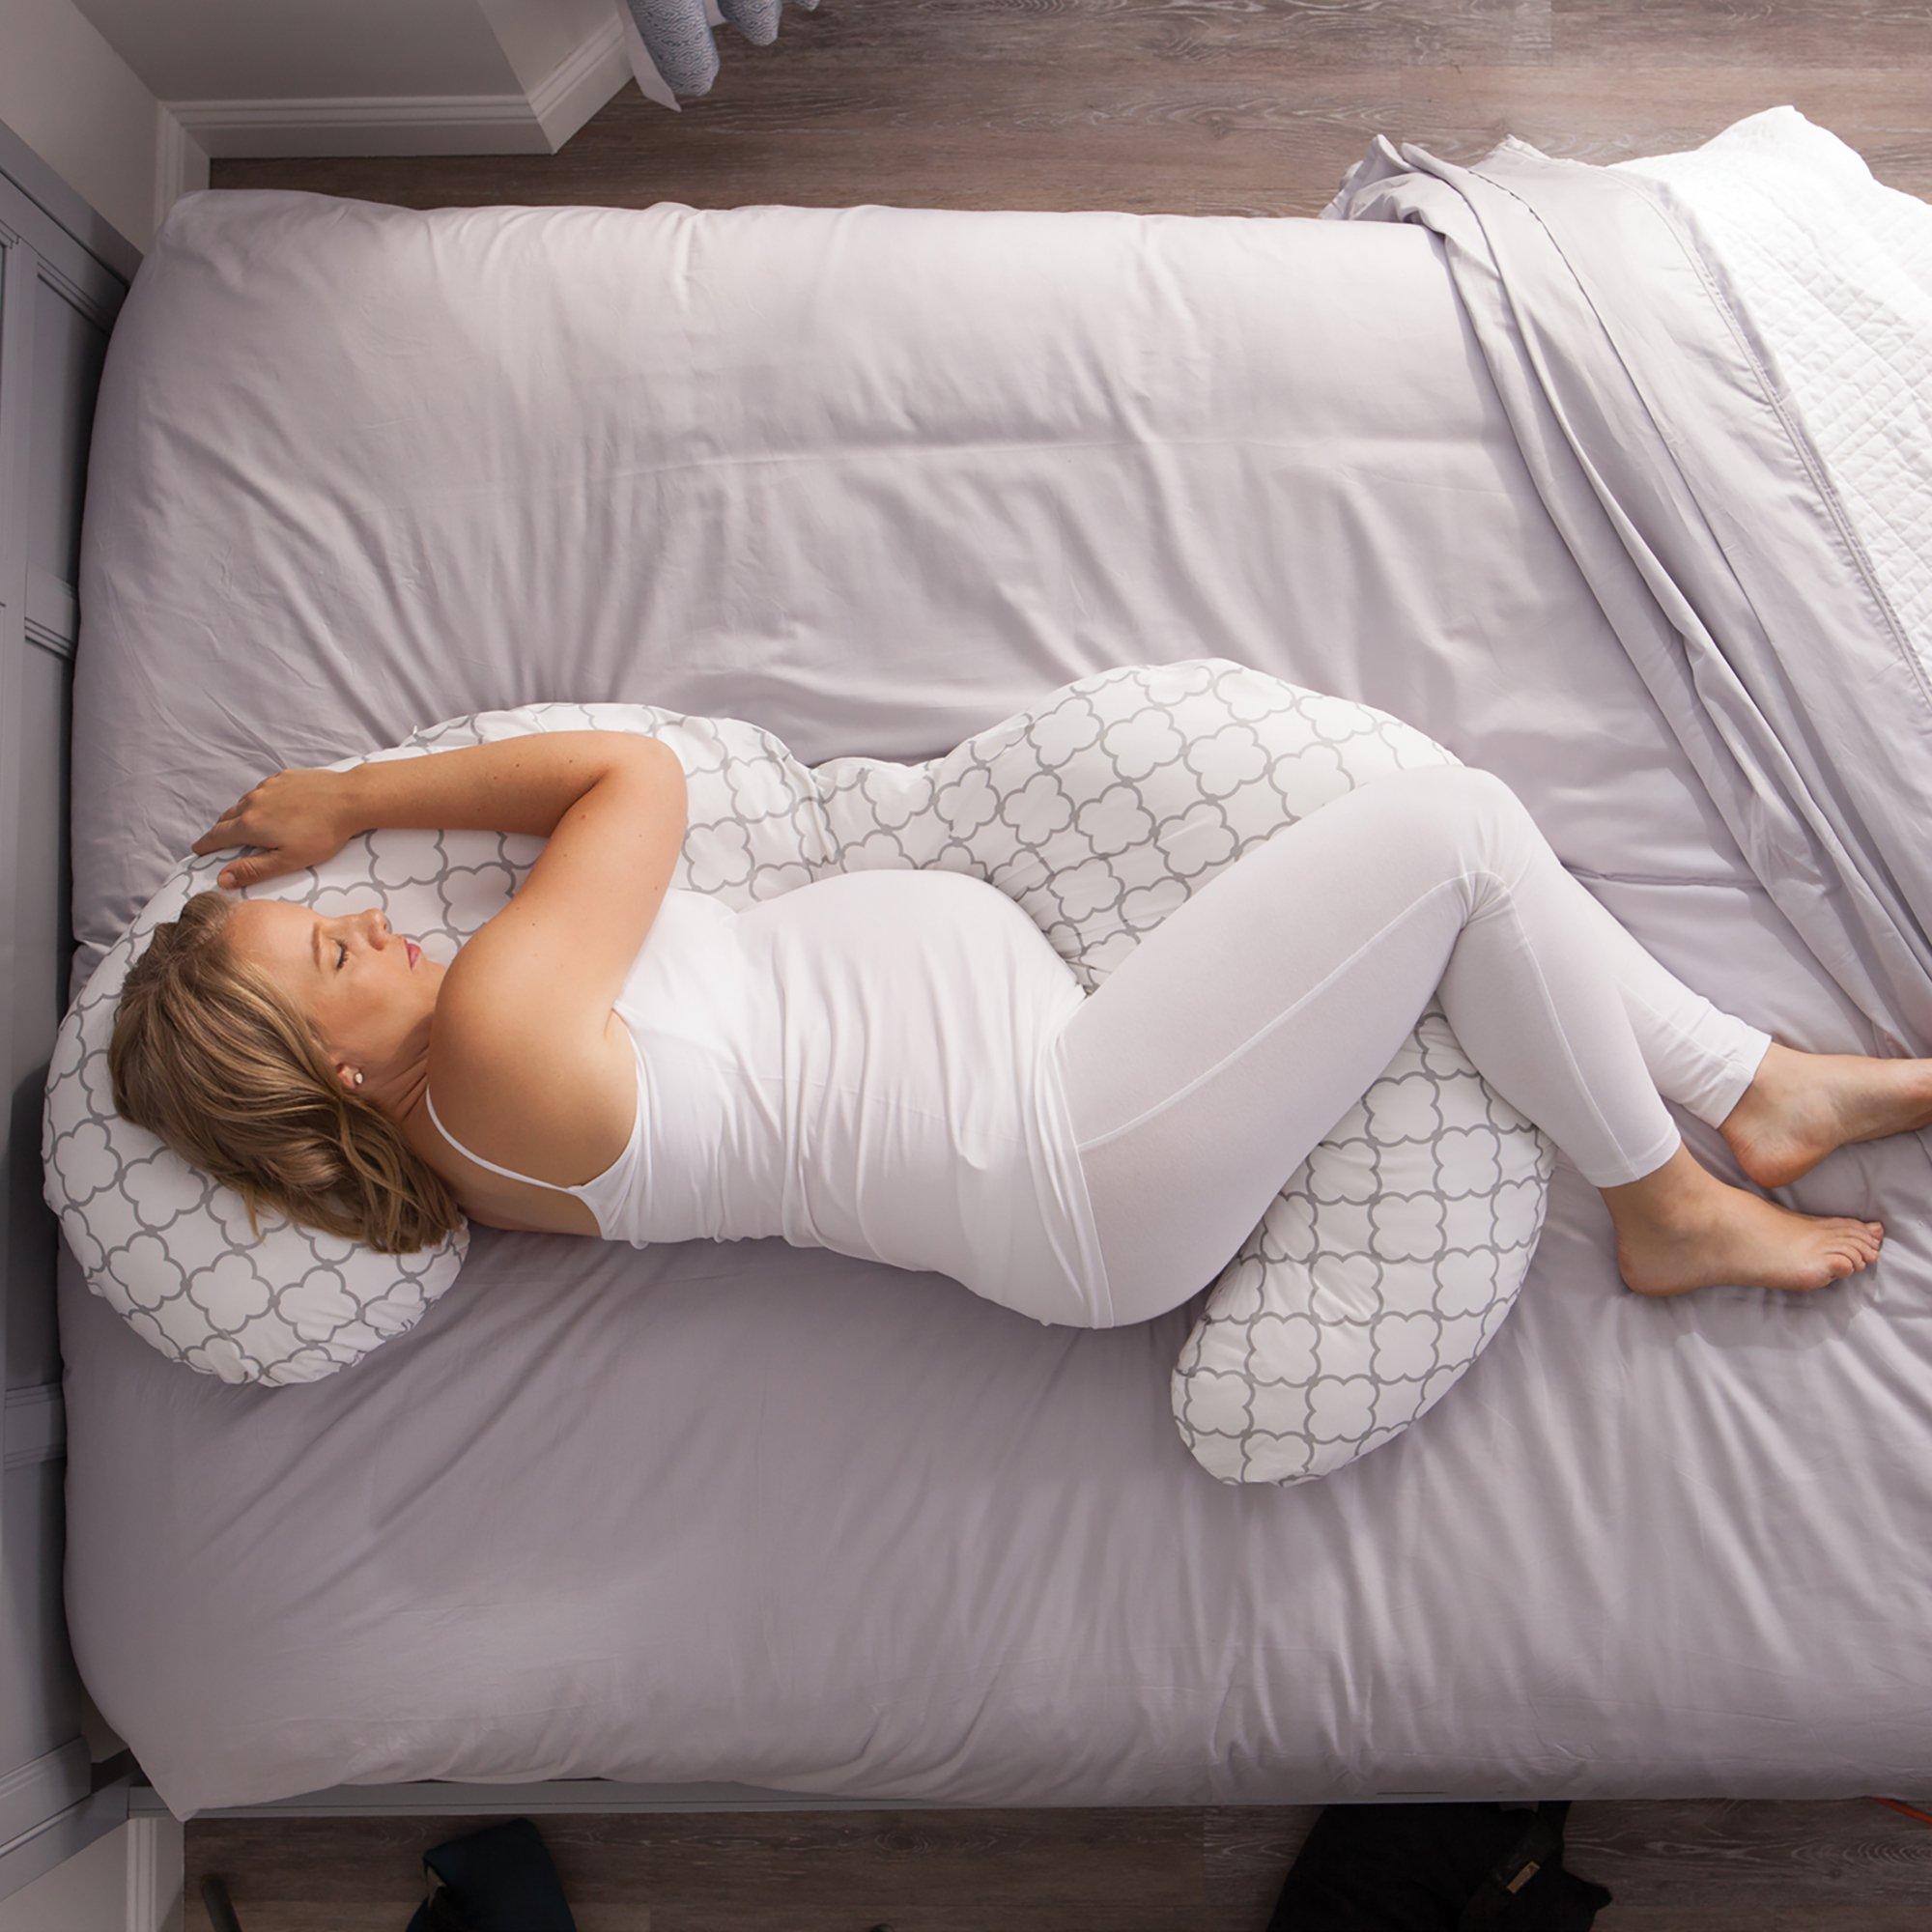 Boppy Slipcovered Pregnancy Body Pillow Trellis White Baby Tools